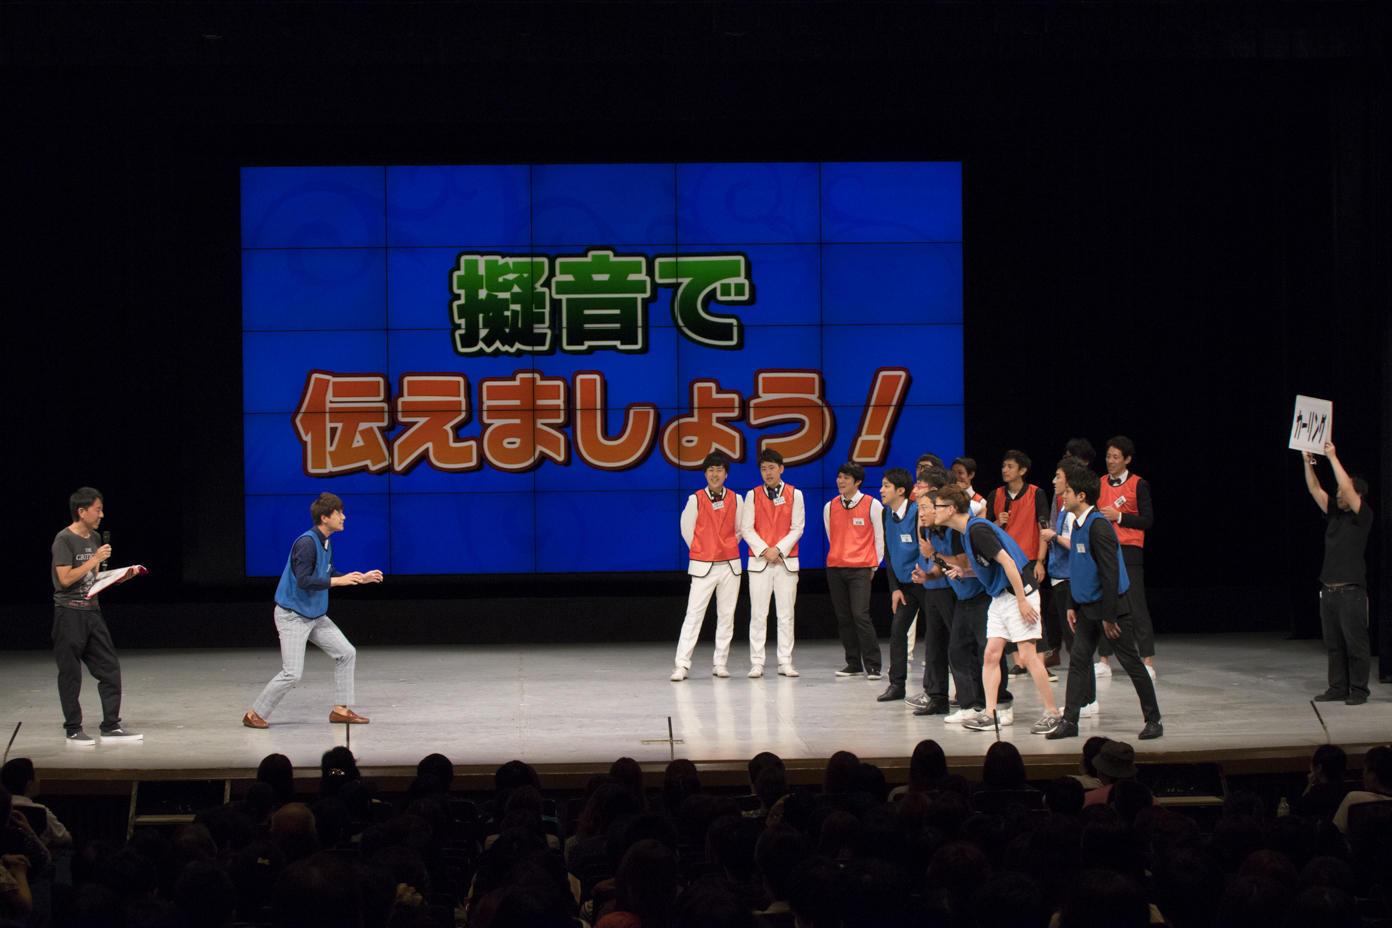 http://news.yoshimoto.co.jp/20160824233127-4860fba40c295cab576b2081c3b028647755f7b0.jpg